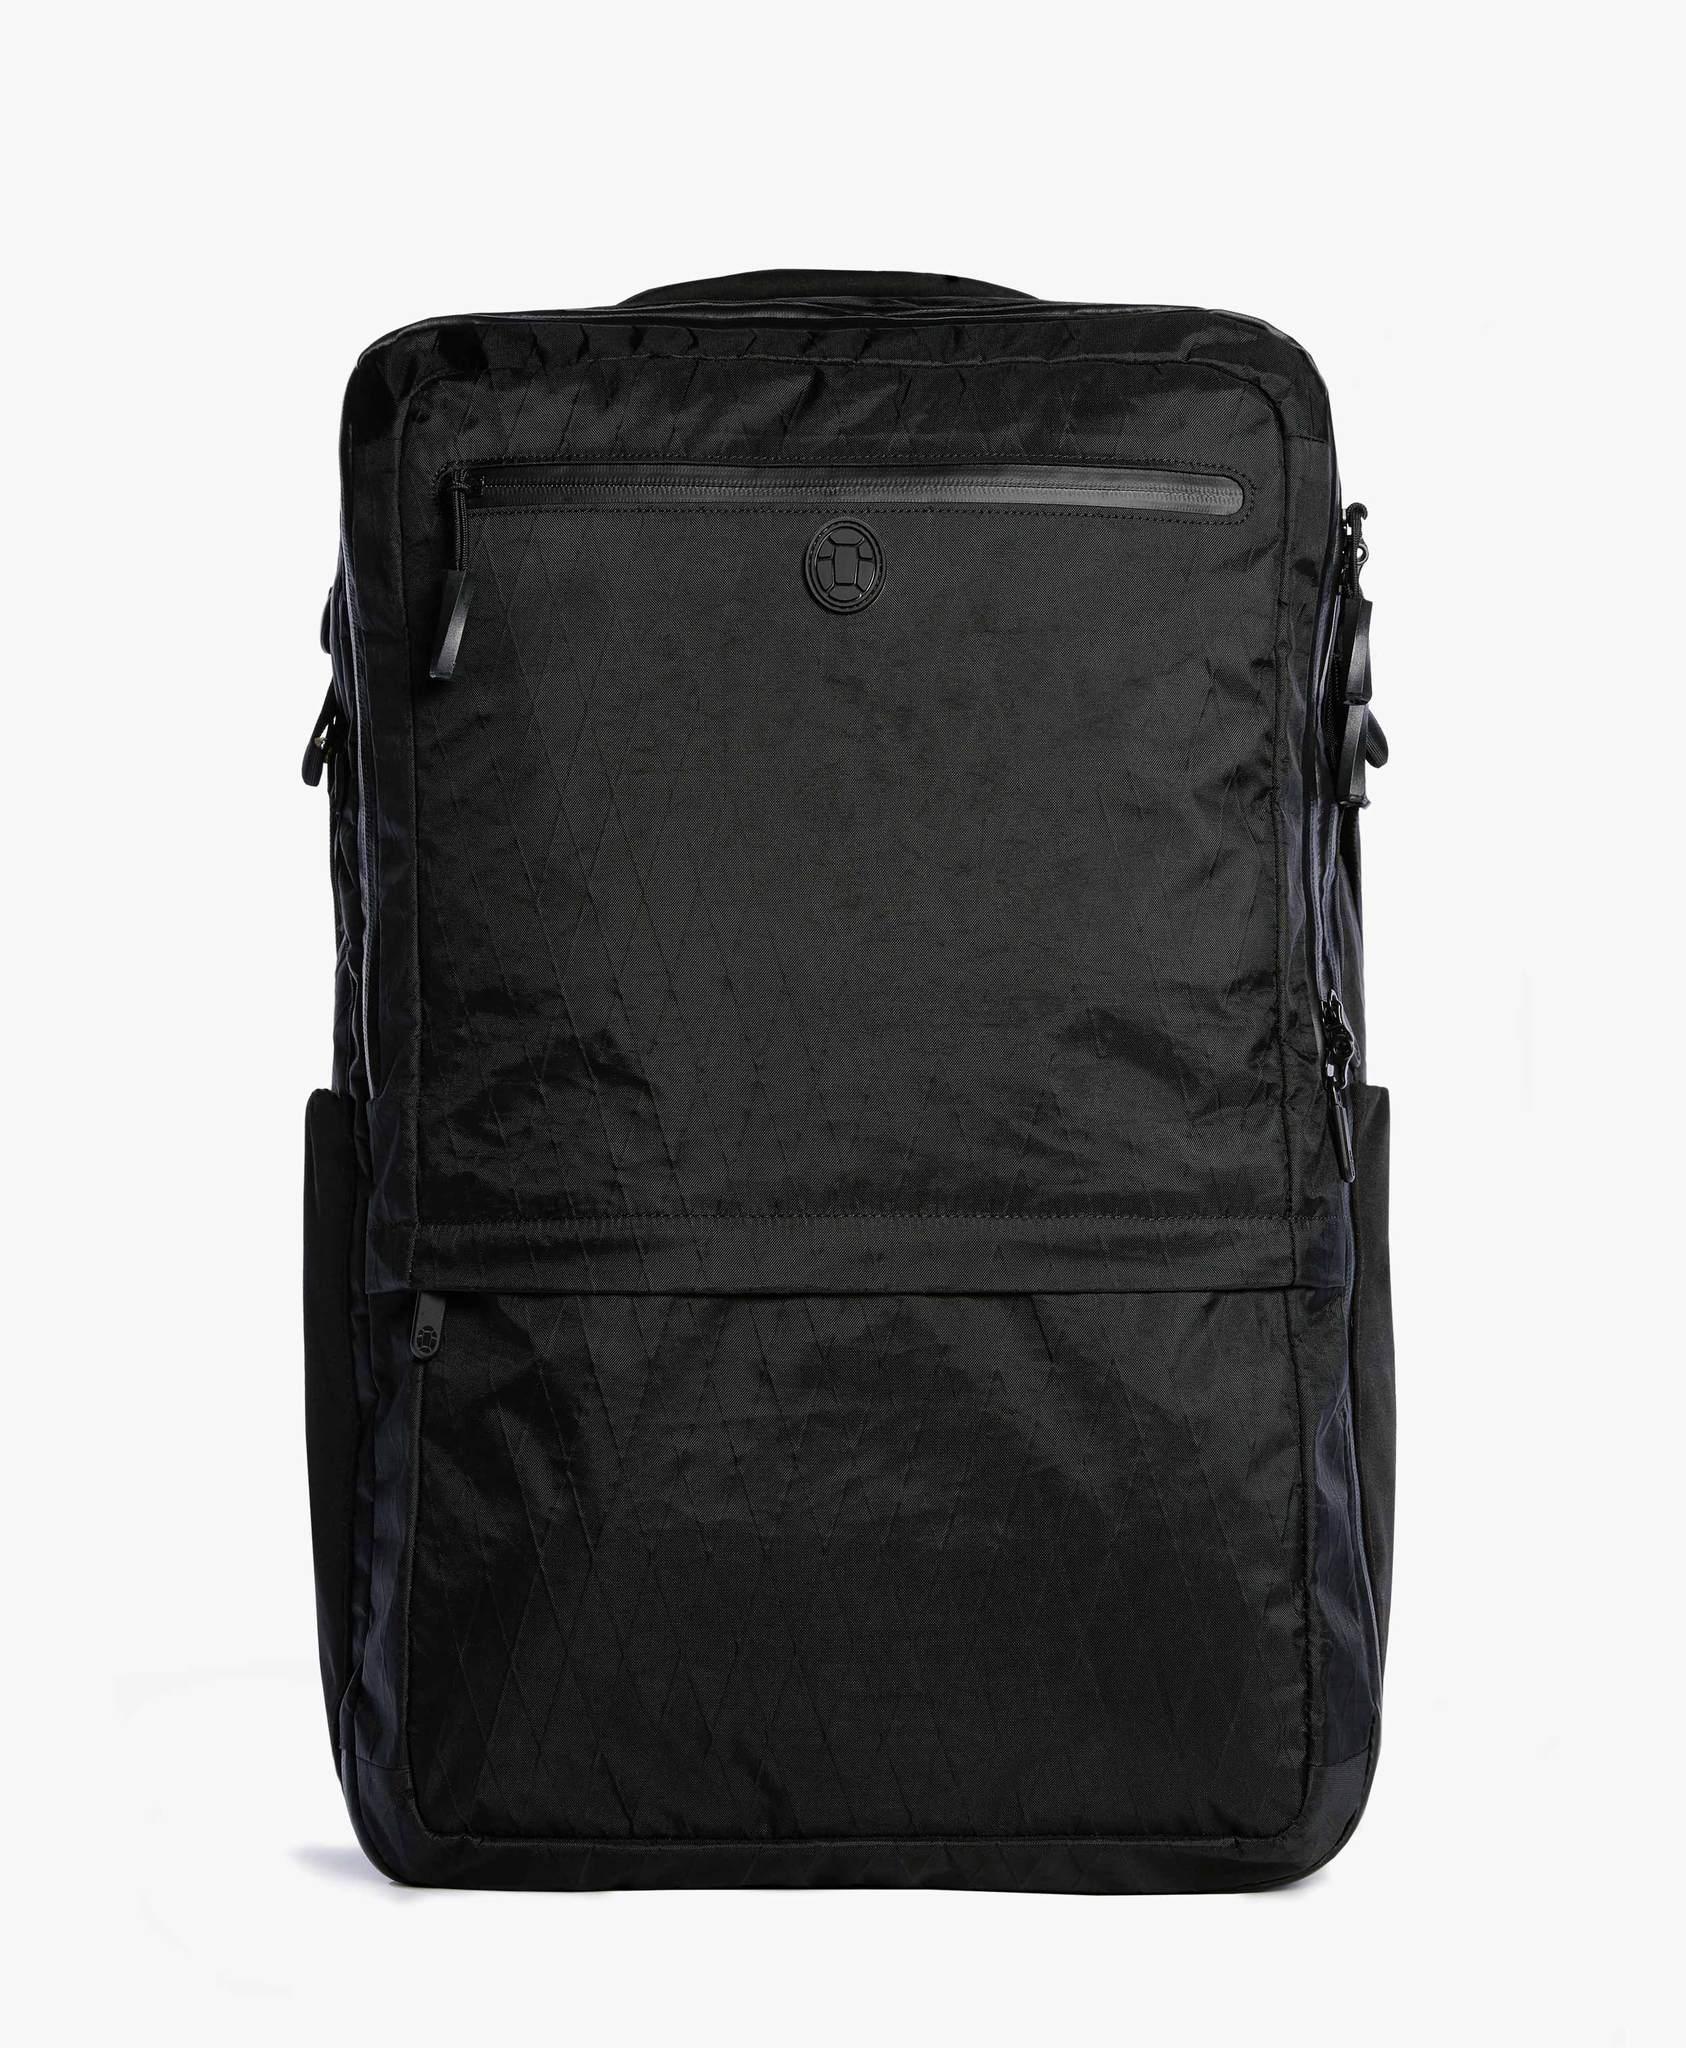 Urban Travel Backpacks